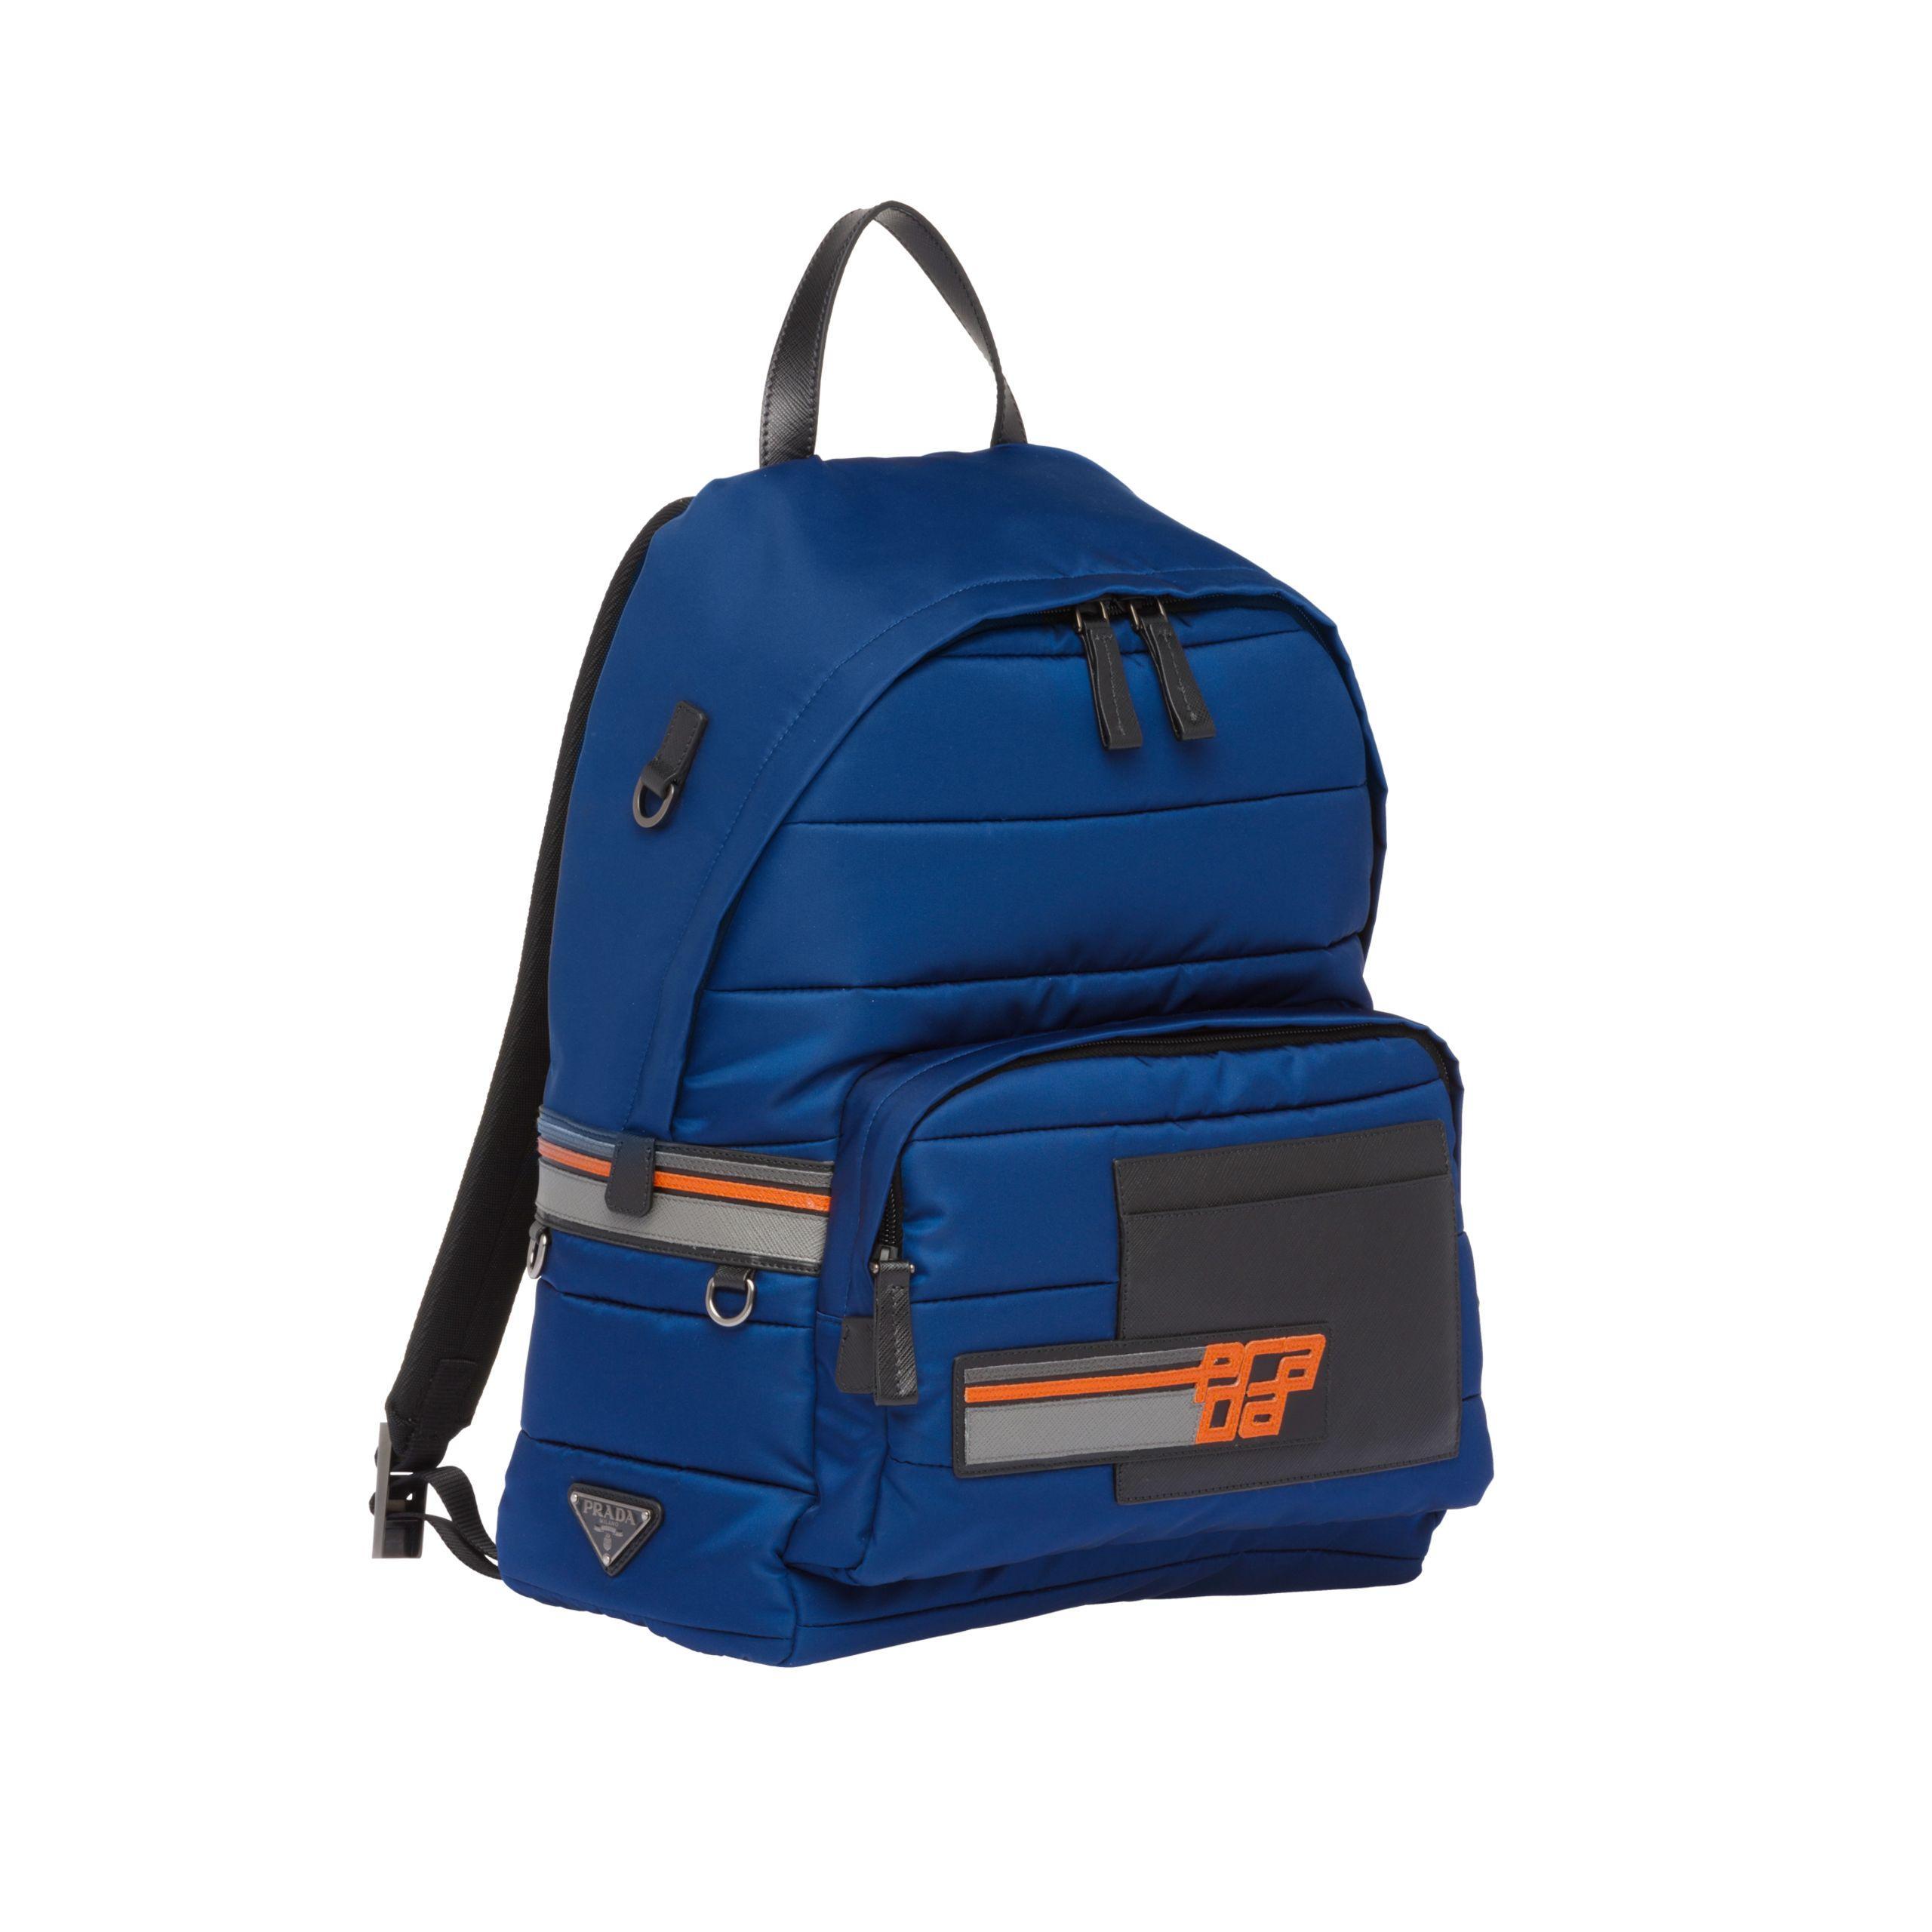 8e20e258f789c8 Prada - Blue Nylon And Saffiano Leather Backpack for Men - Lyst. View  fullscreen